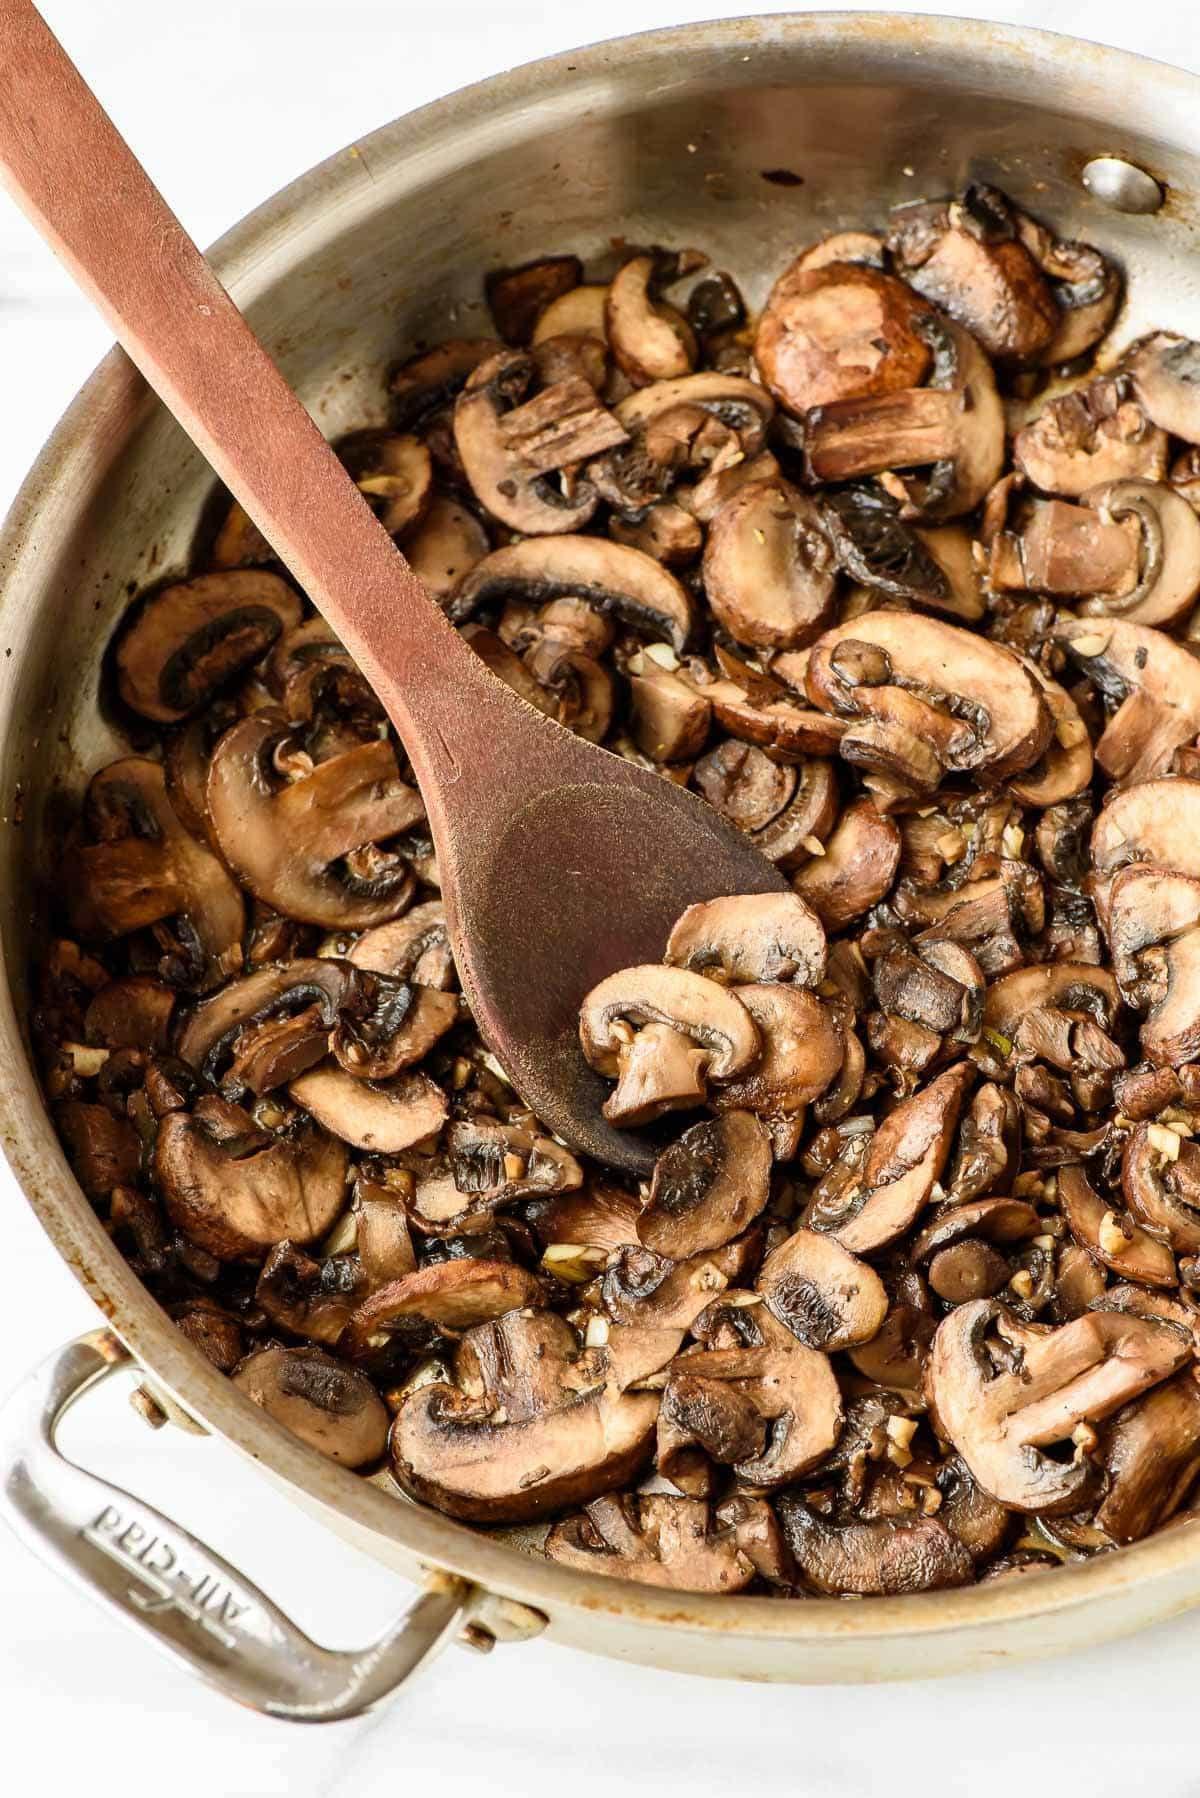 Quinoa Mushroom Recipe  Skillet Mushroom Chicken and Quinoa 30 Minutes